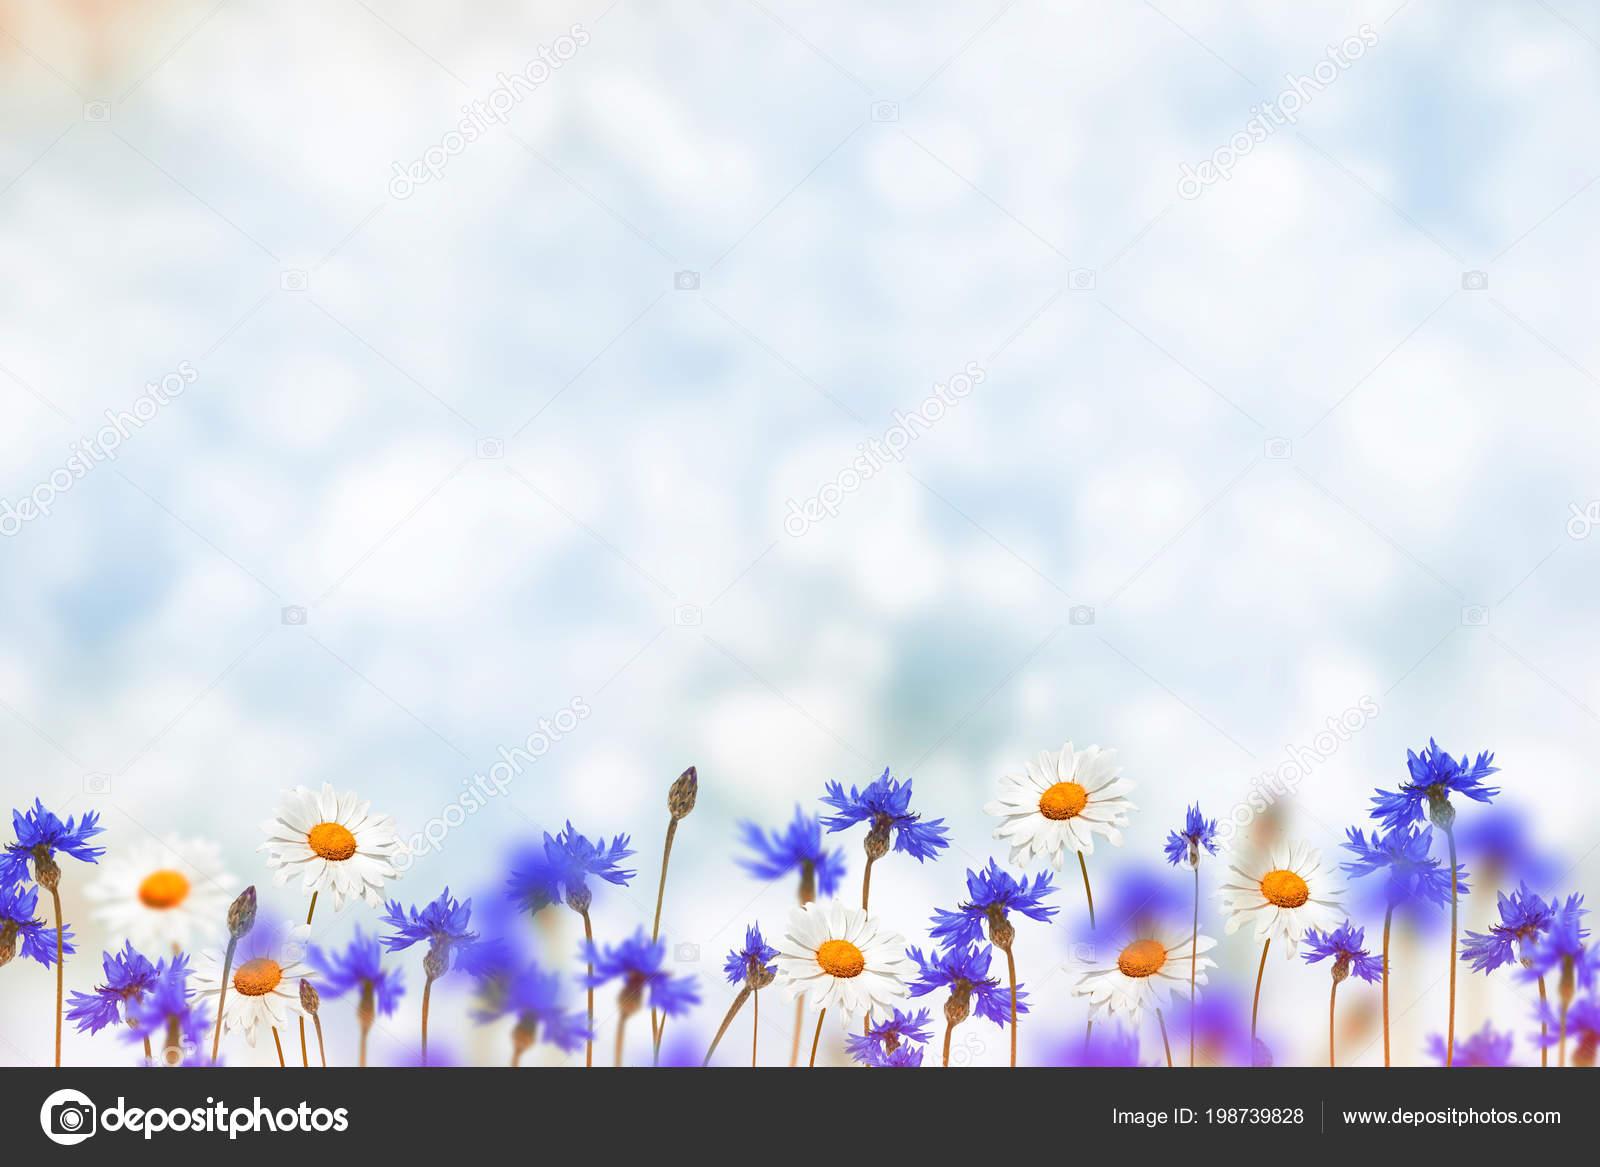 Field Cornflower Blue Flowers Background Summer Landscape Stock